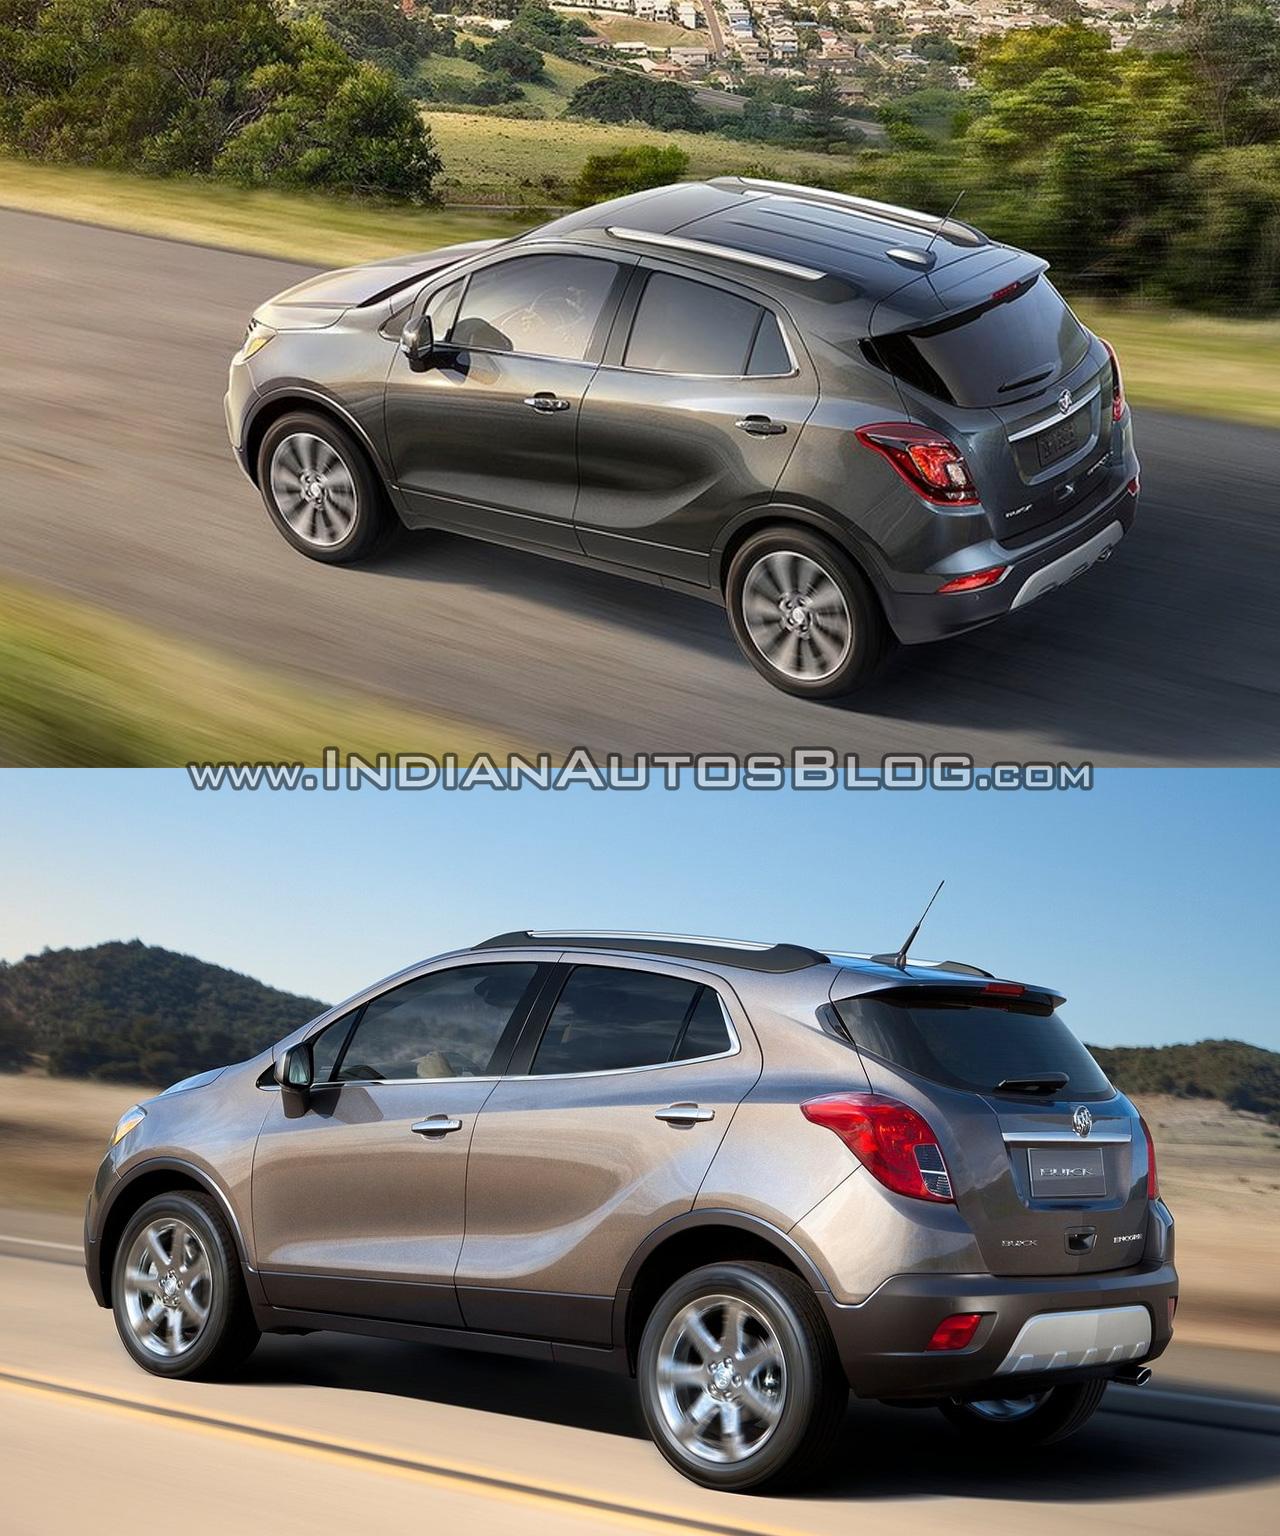 2013 Buicks: 2017 Buick Encore Vs. 2013 Buick Encore Rear Three Quarters